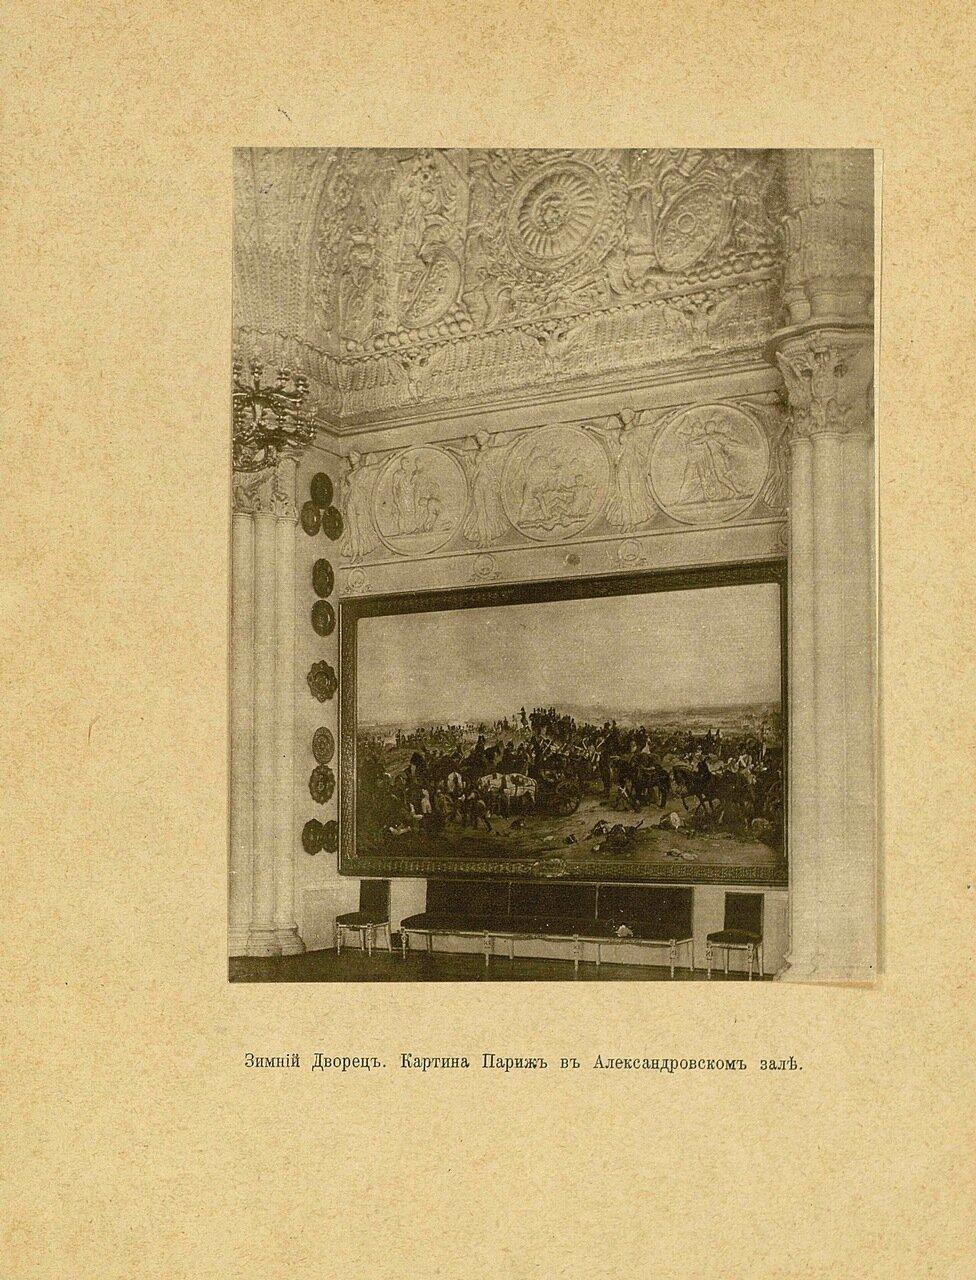 Картина Париж в Александровском зале